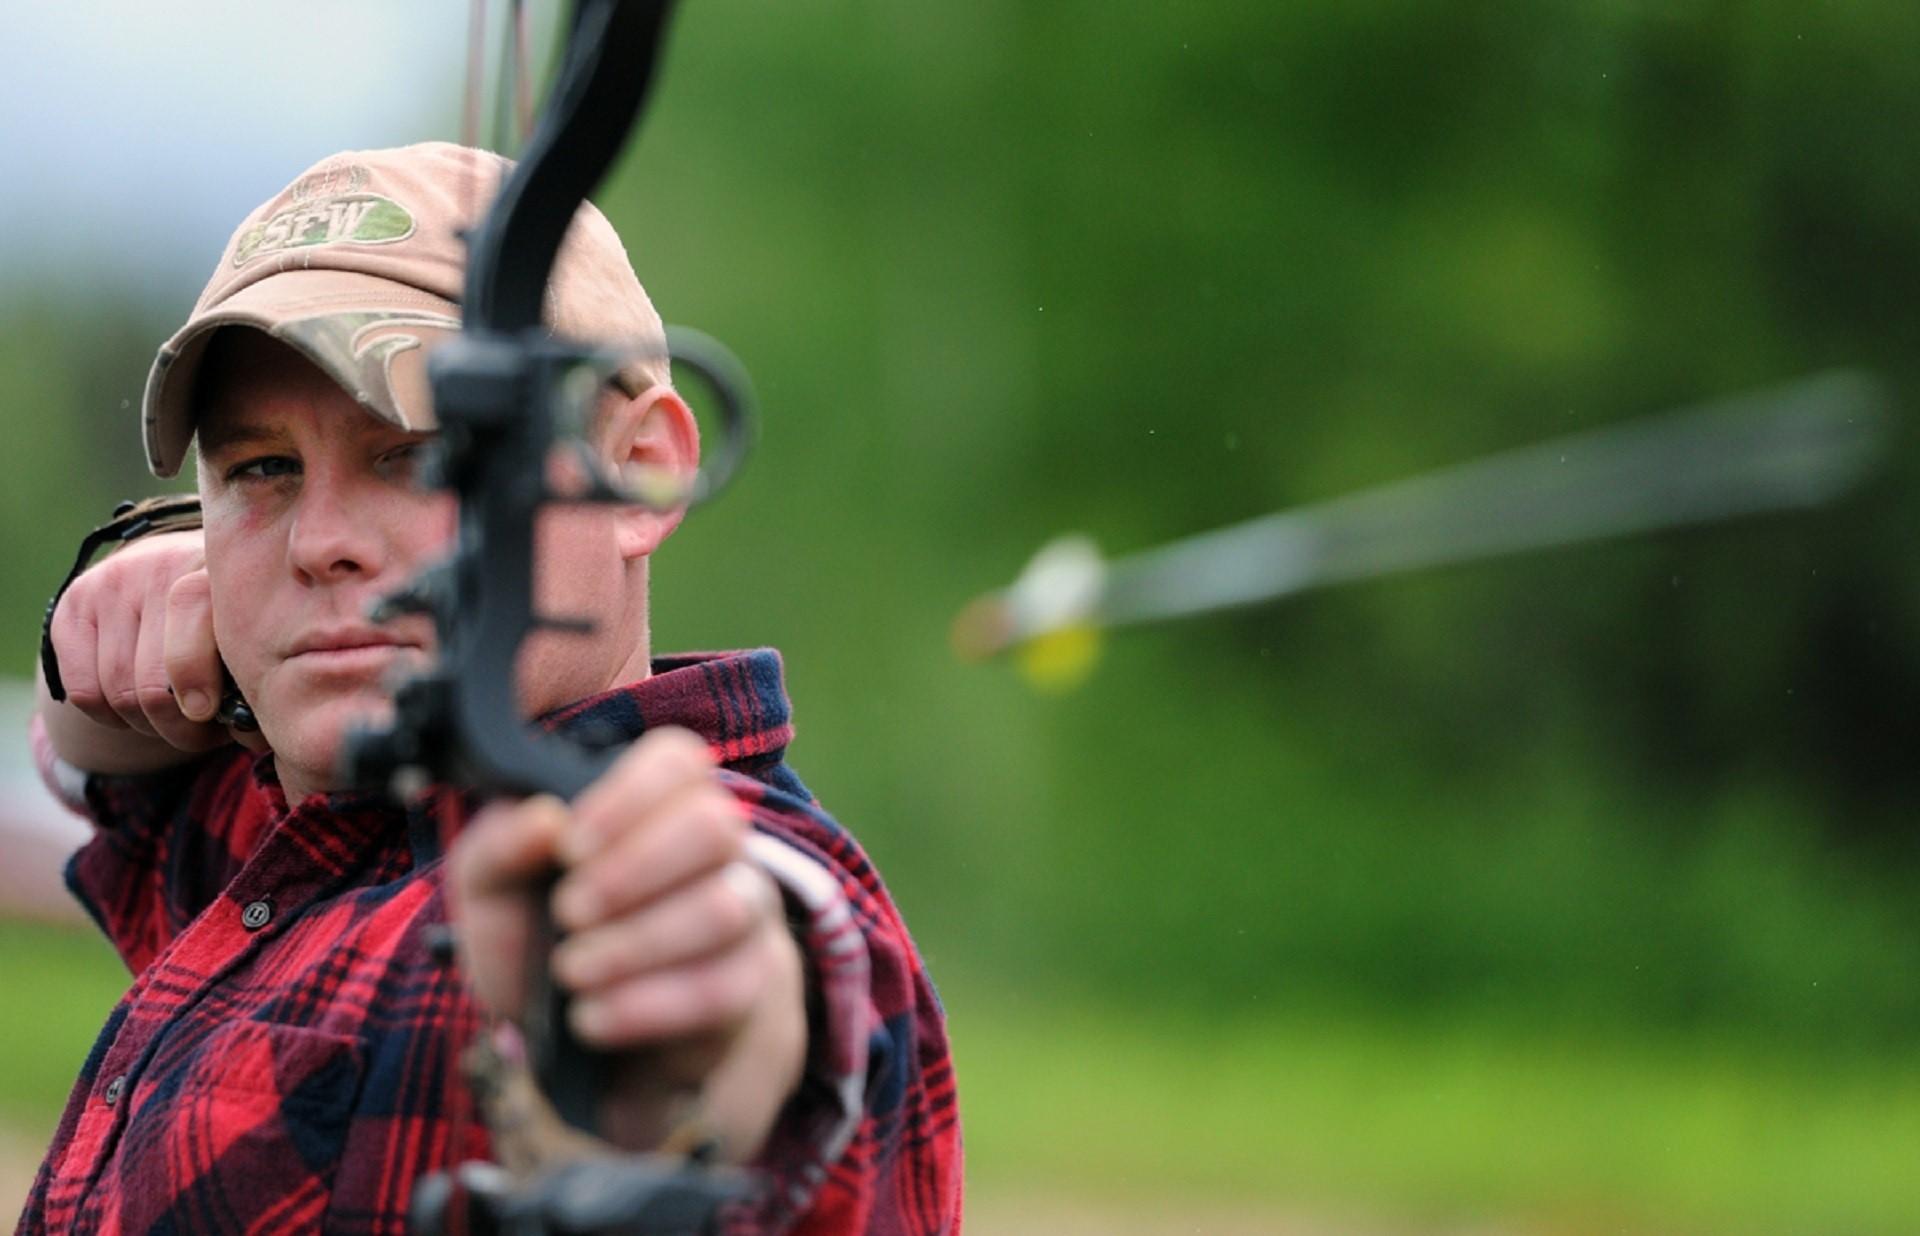 Man in plaid shirt firing an arrow